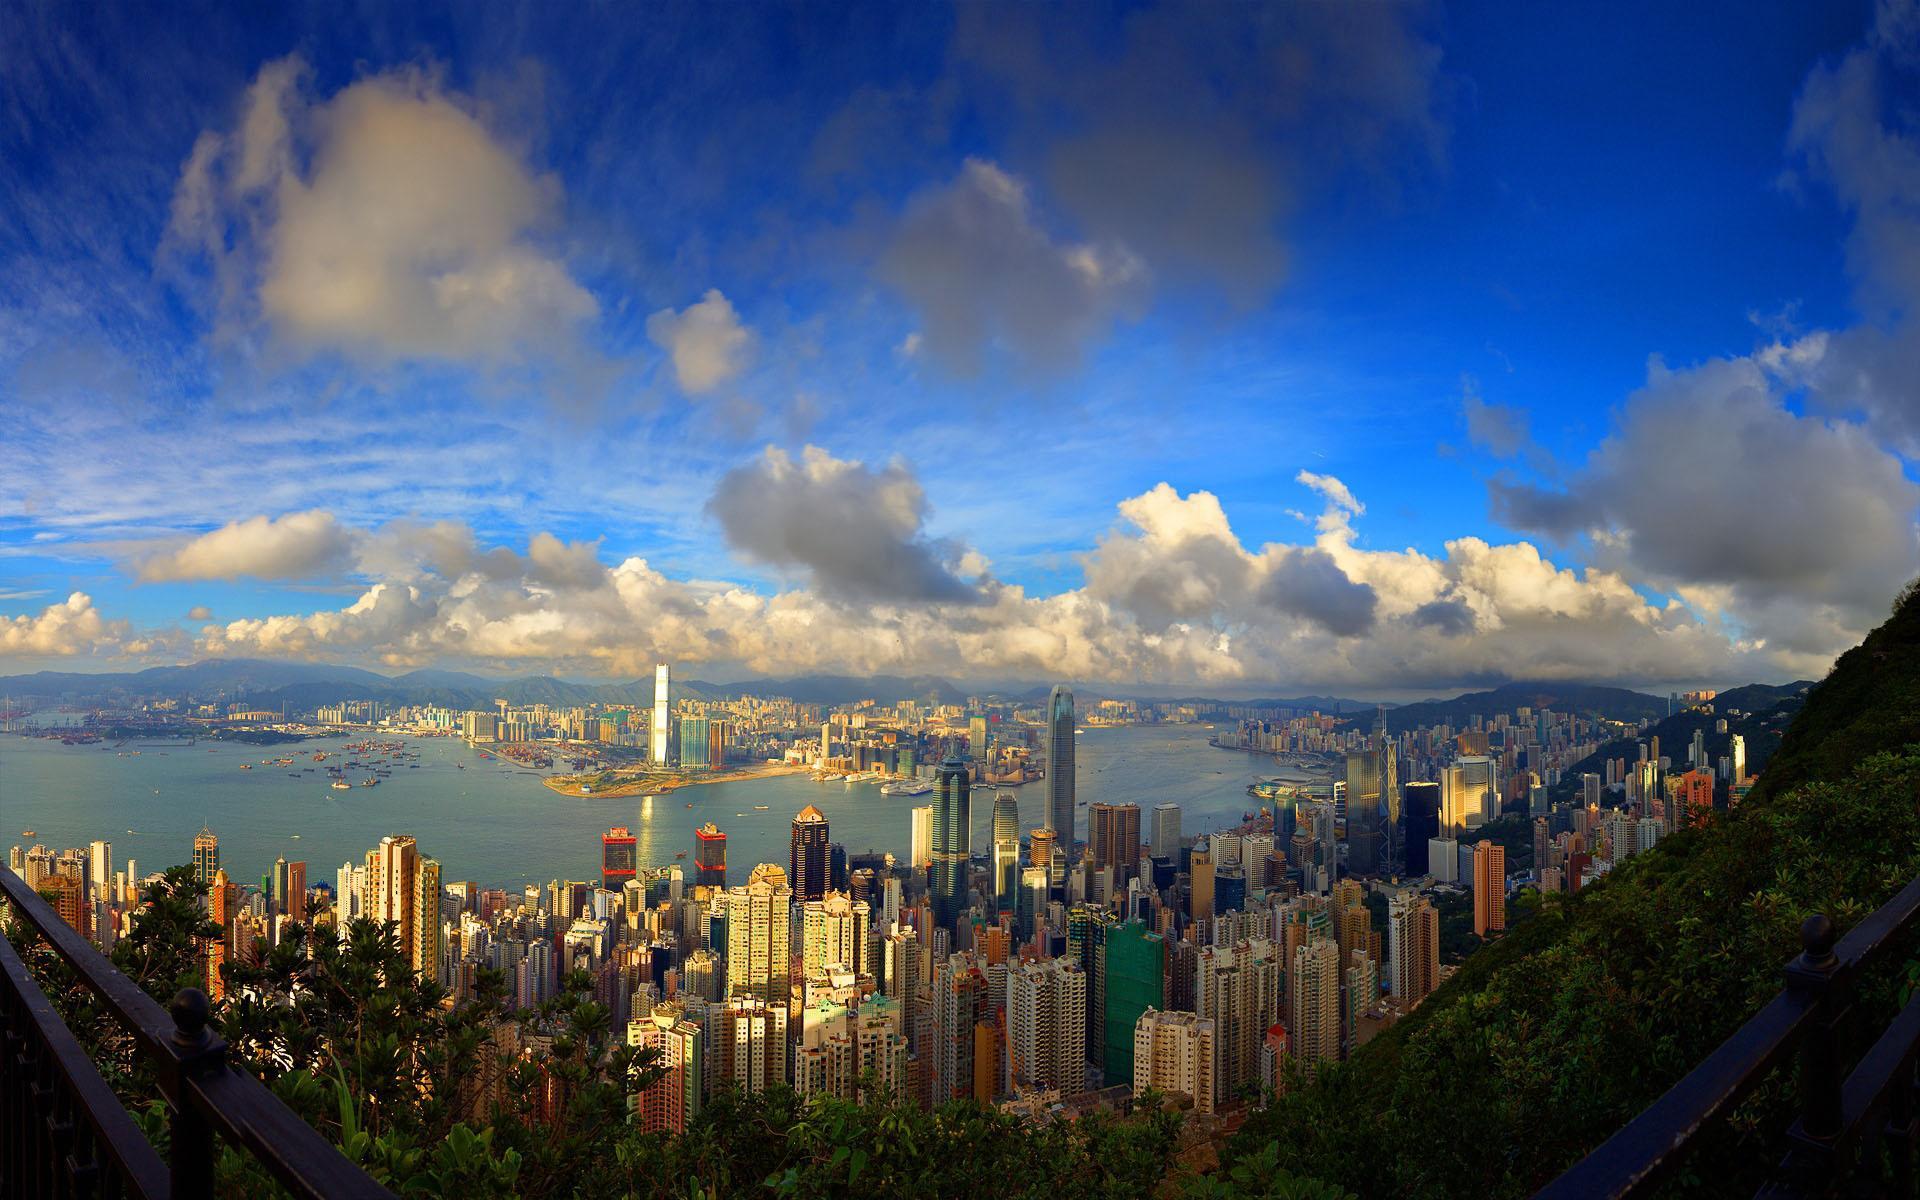 beautiful view wallpaper,sky,metropolitan area,cityscape,urban area,city